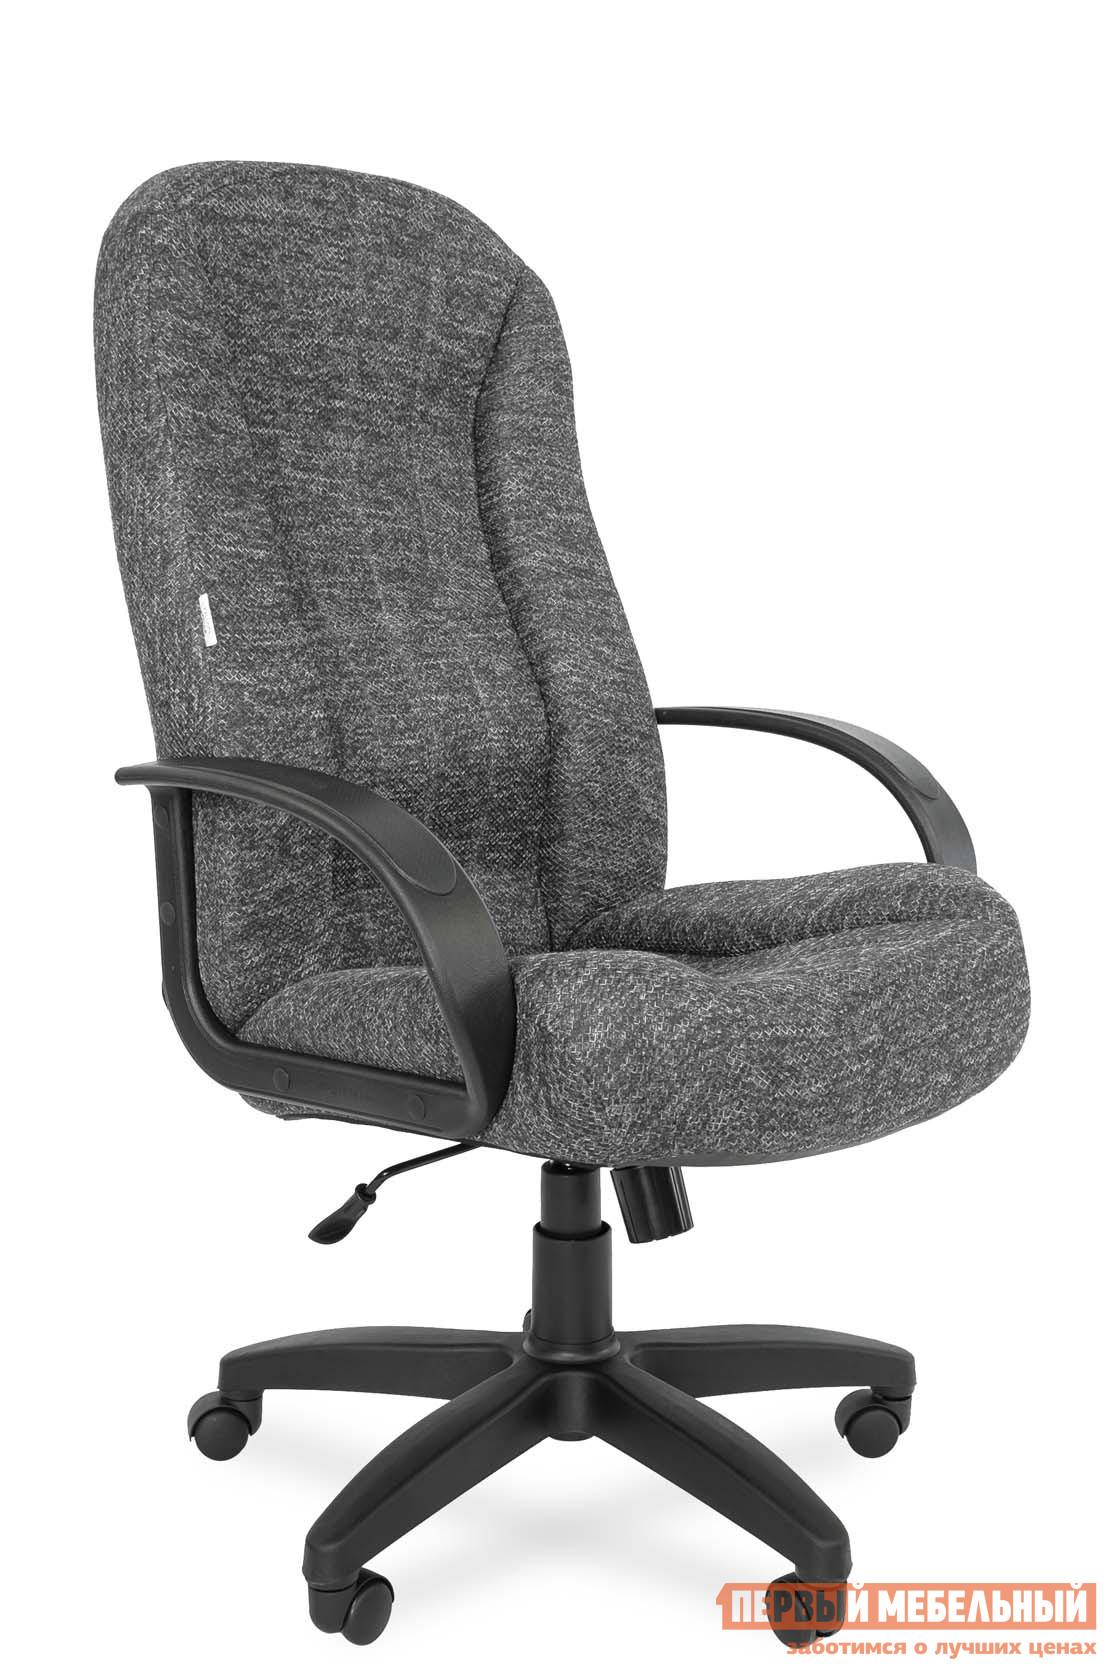 Офисное кресло Русские кресла РК 185 / РК 185 TW / РК 185 SY офисное кресло русские кресла рк 127 tw рк 127 sy рк 127 s